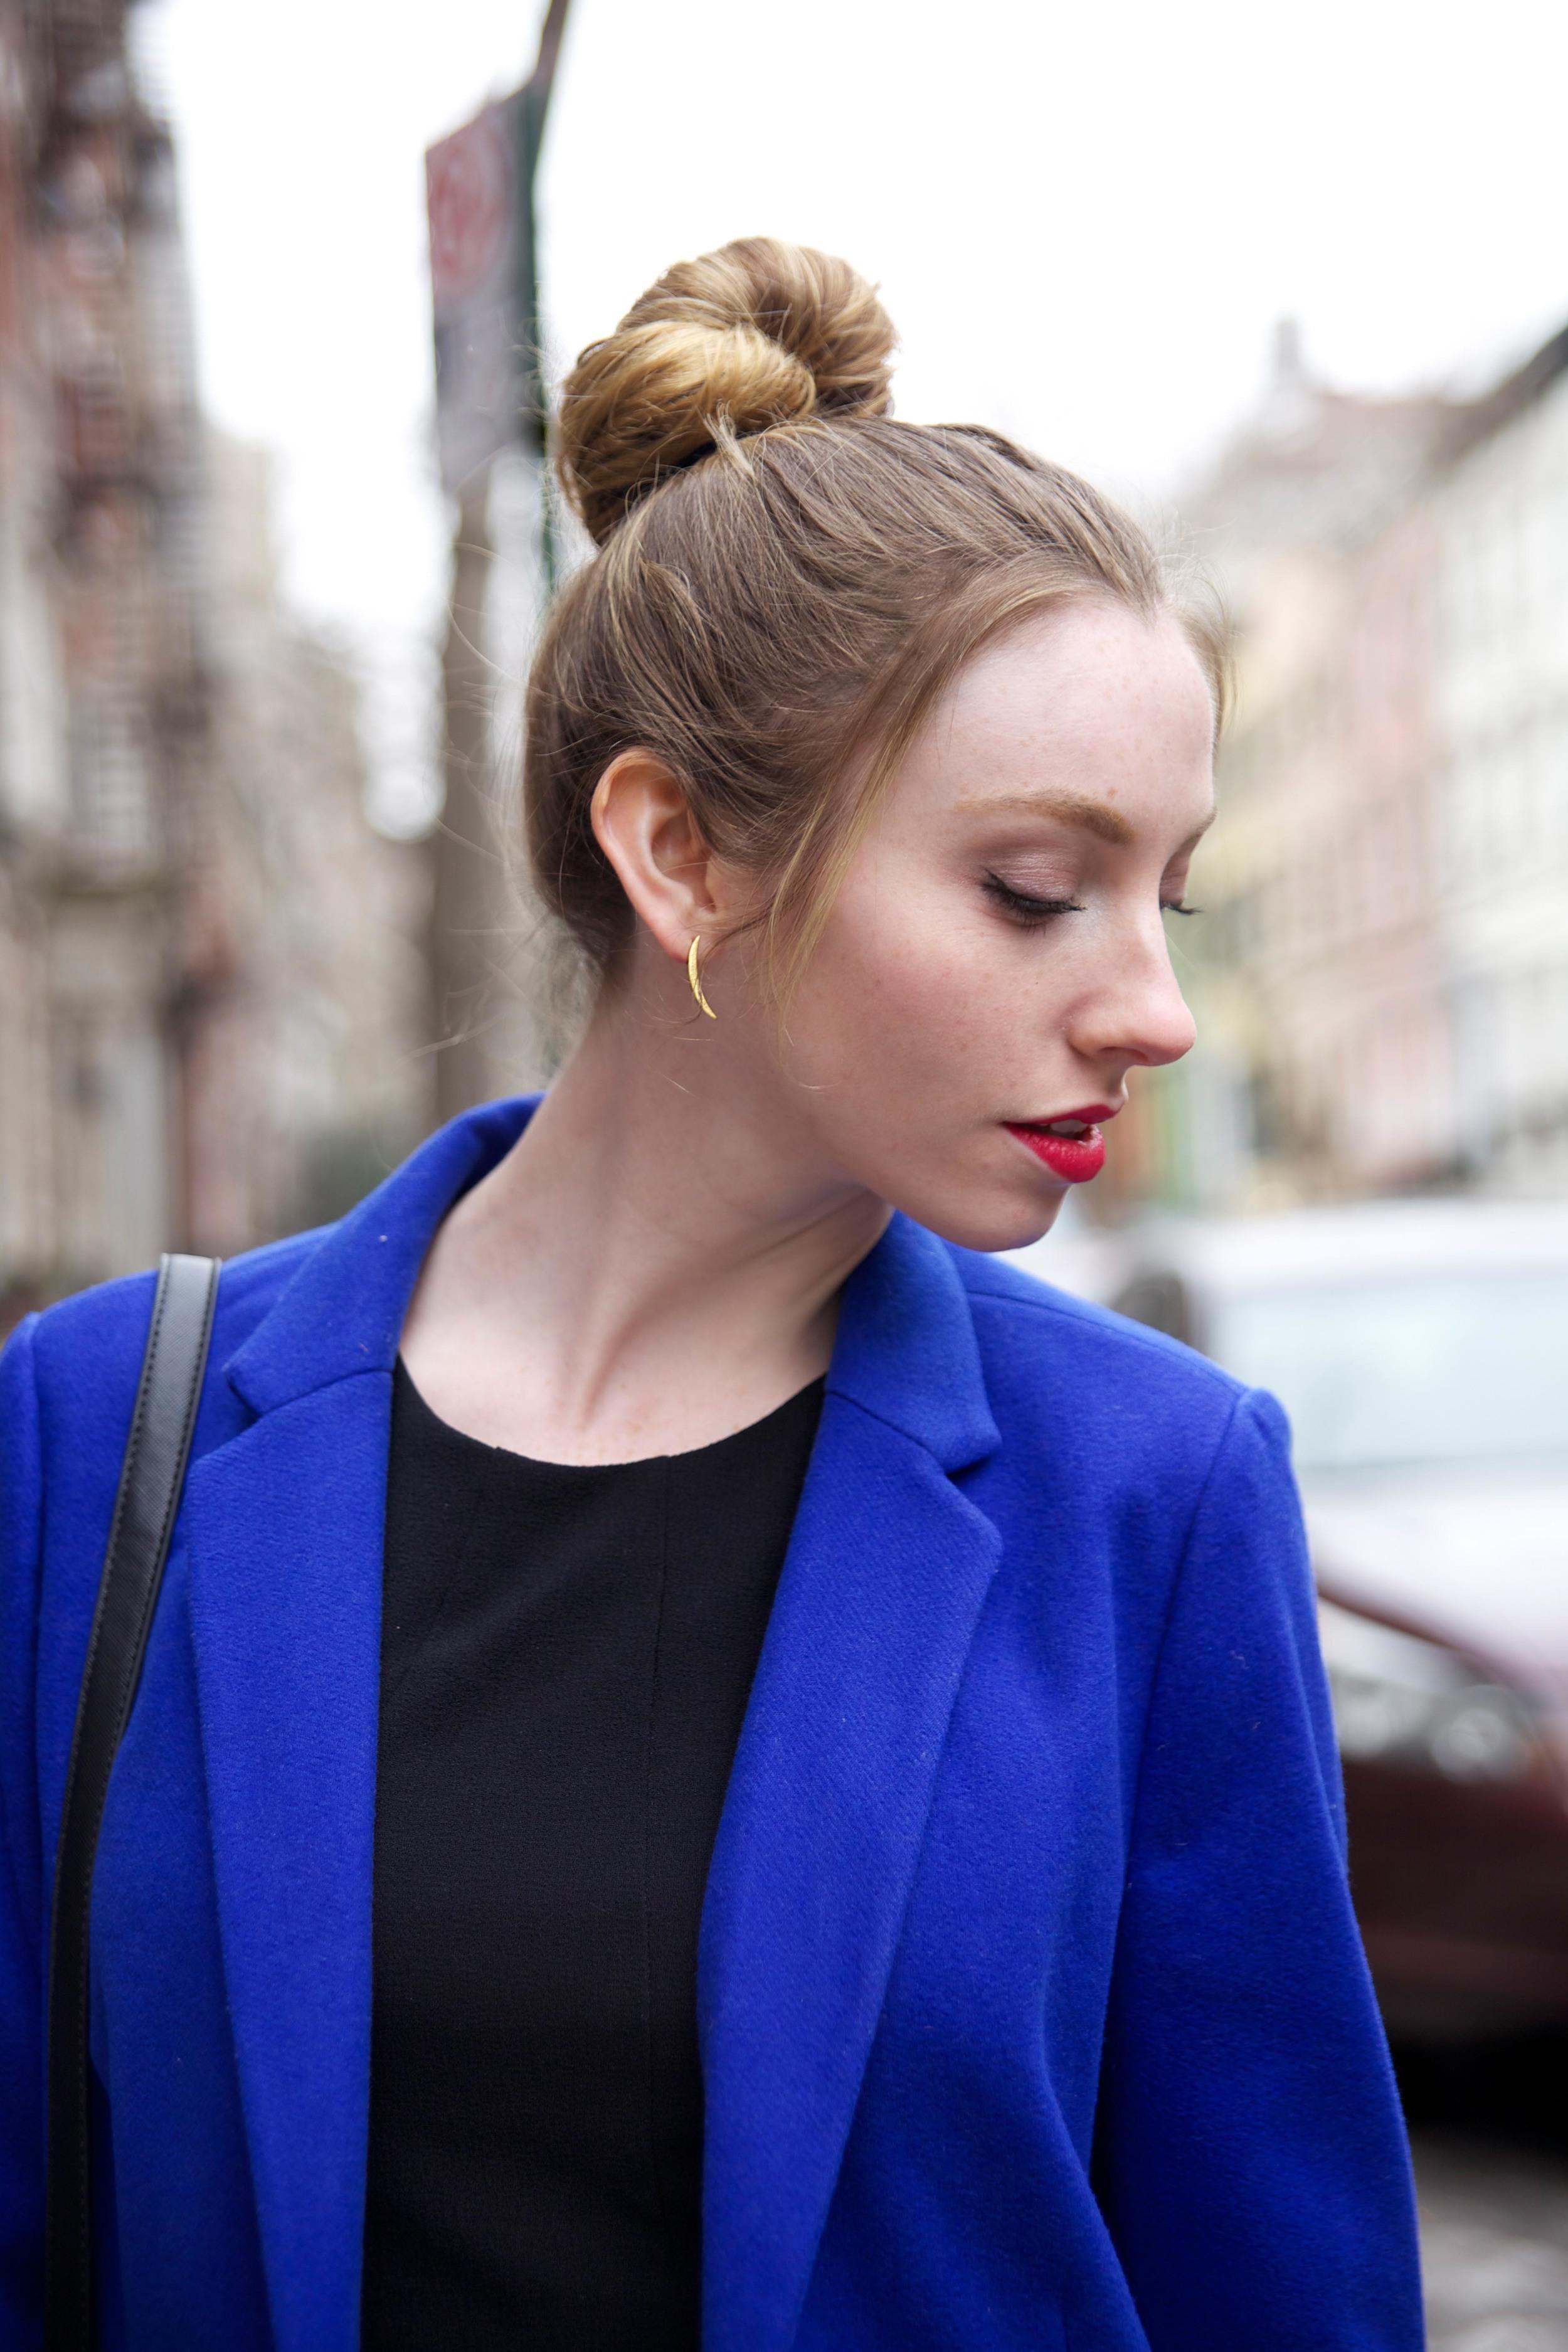 Earrings via Rocksbox | Girl x Garment